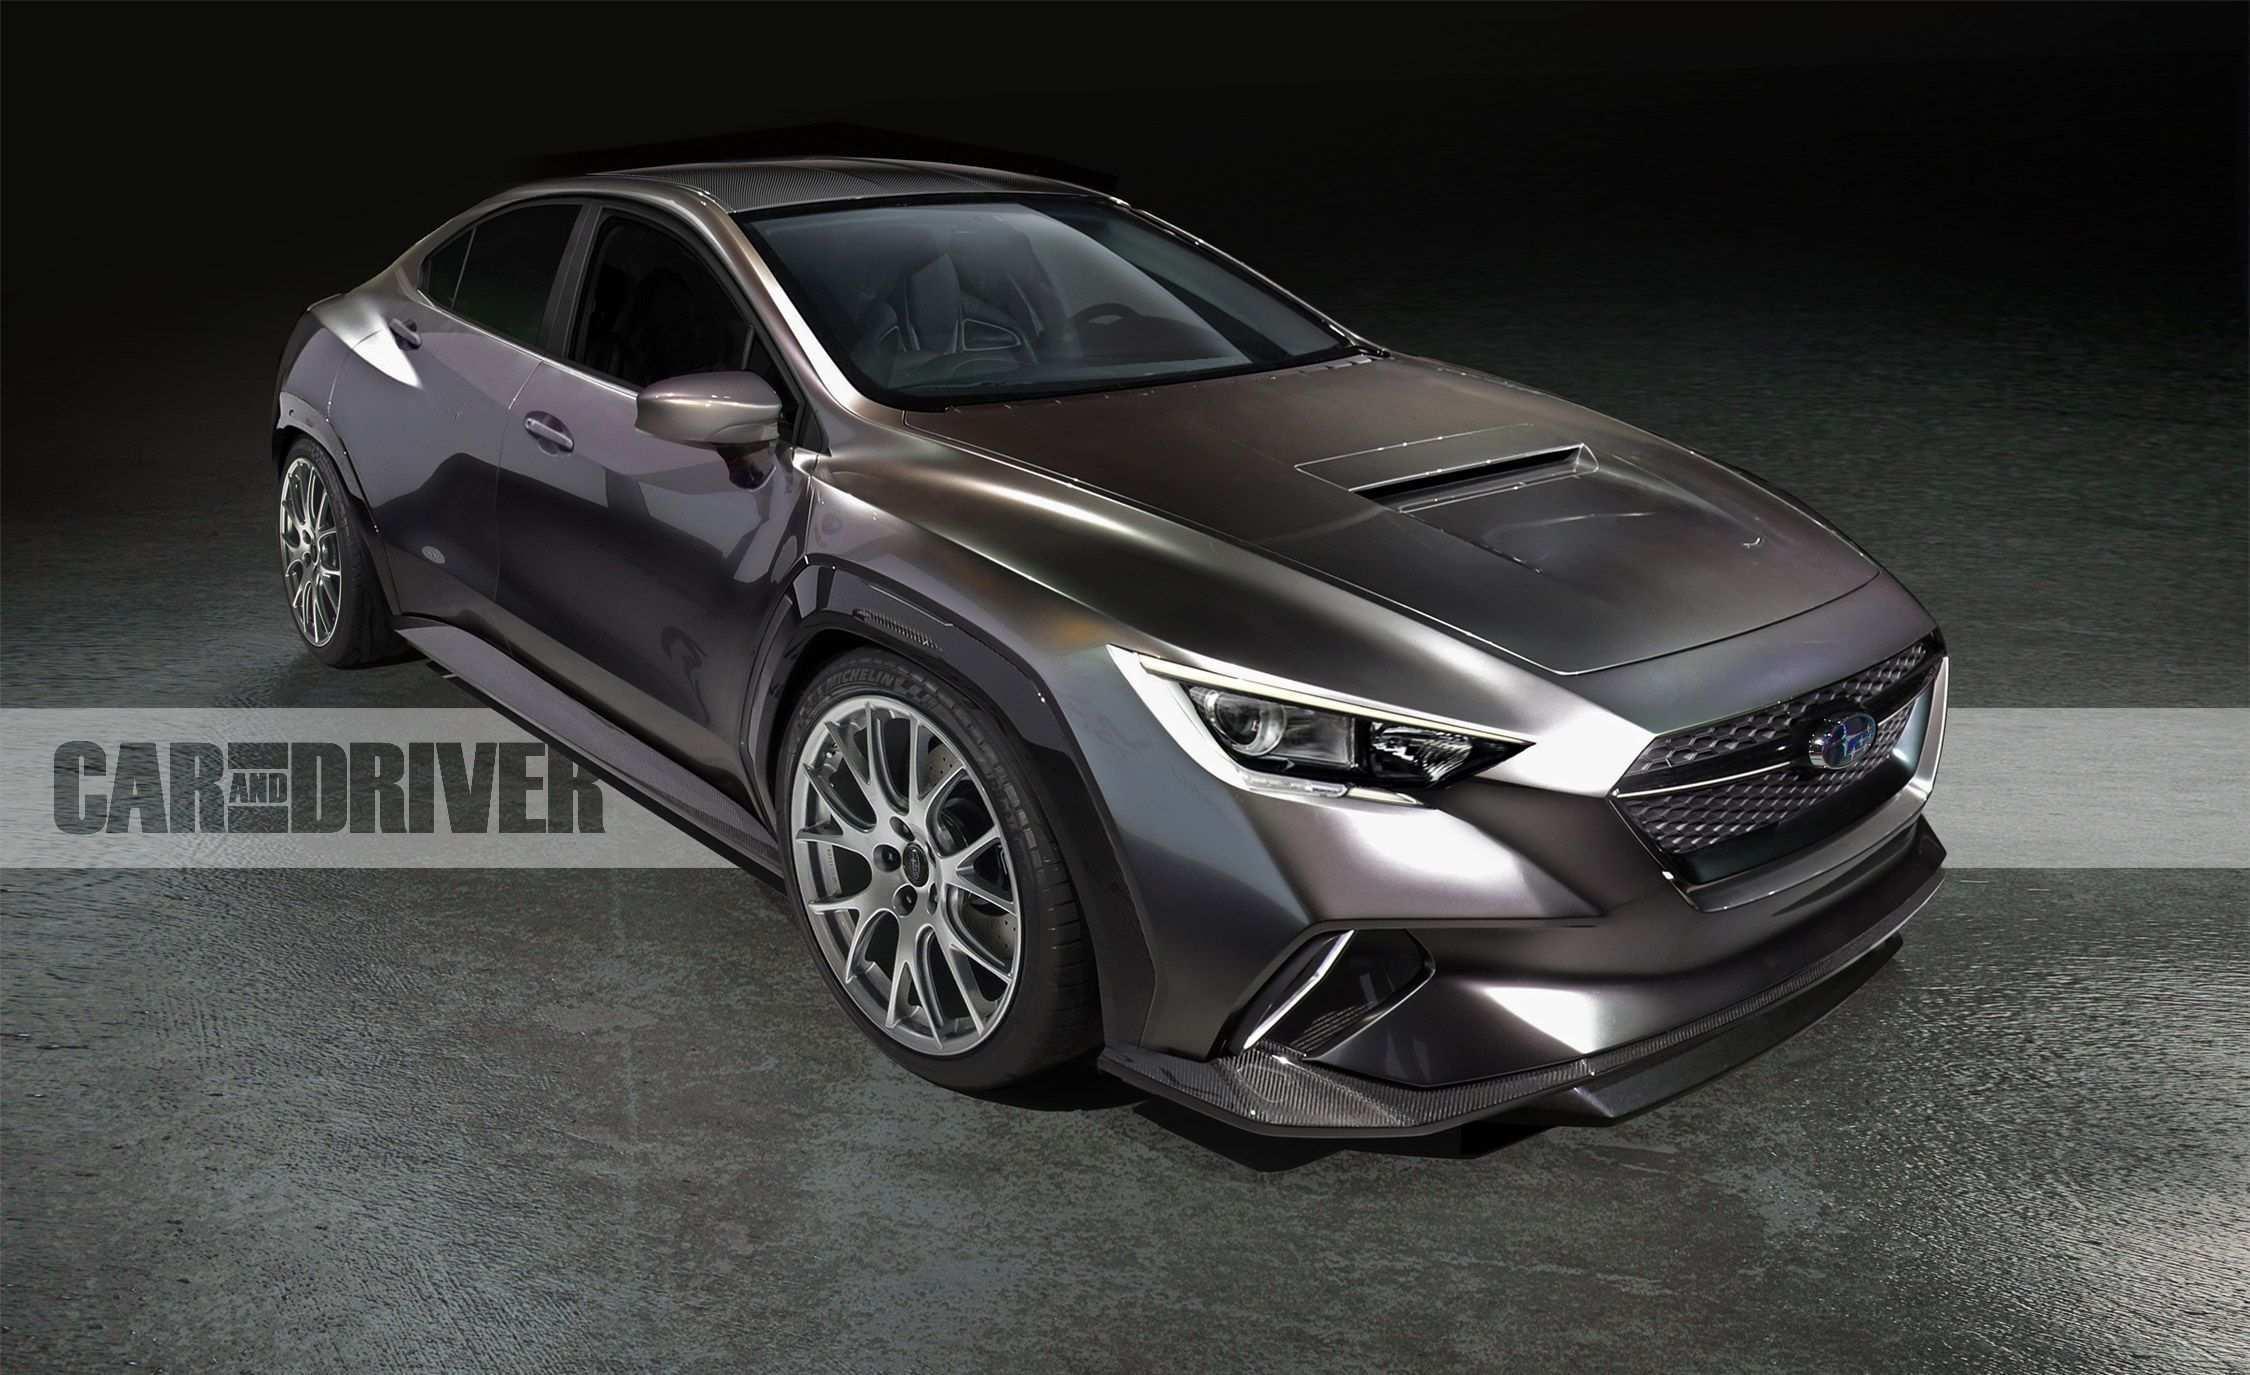 42 Concept of Subaru Sti Hatchback 2020 Pricing for Subaru Sti Hatchback 2020